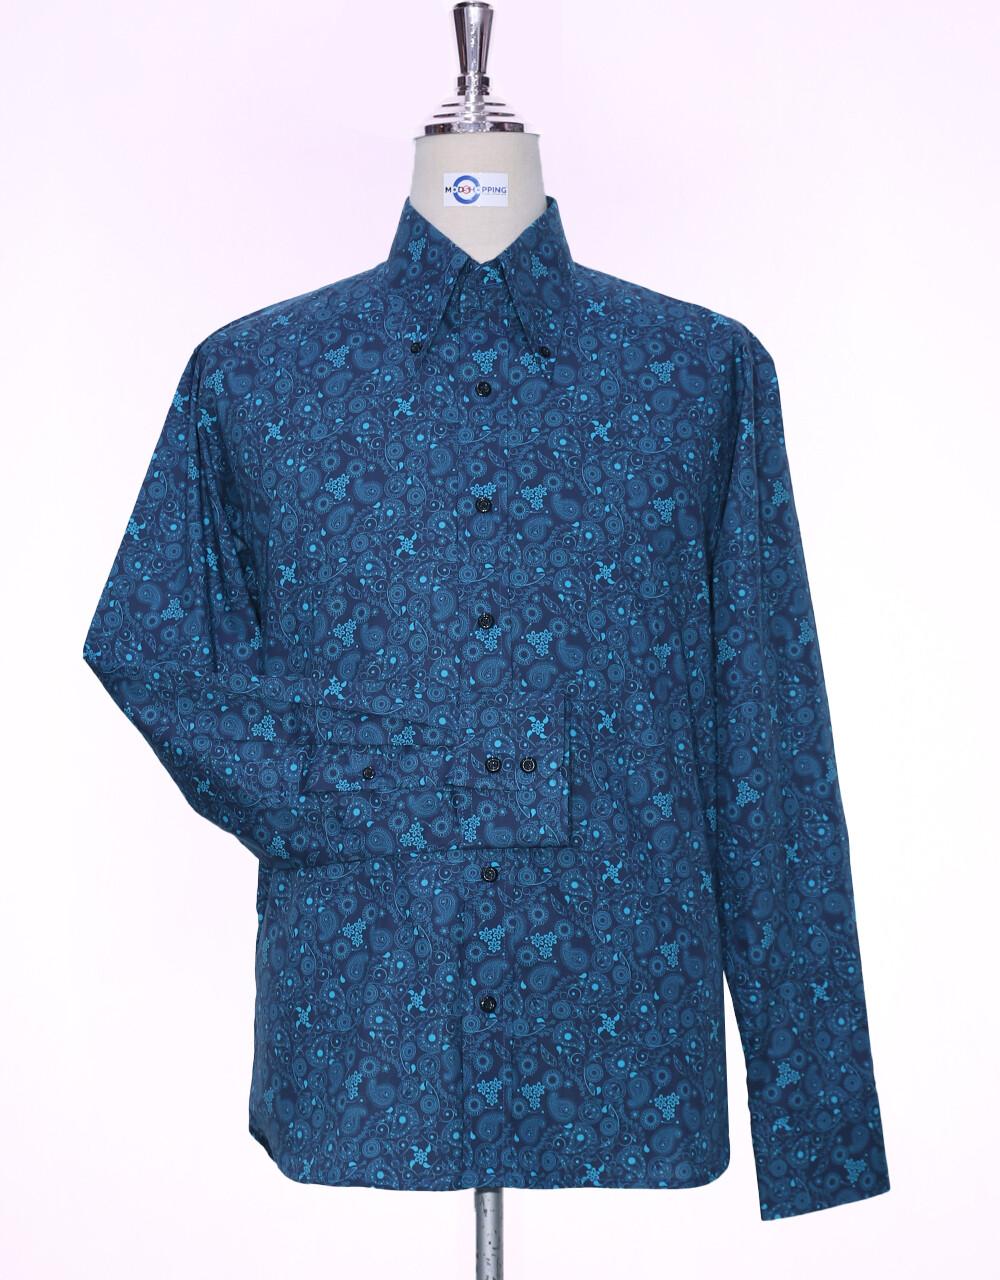 Paisley Shirt | 60s Style Navy Blue Paisley Shirt For Men